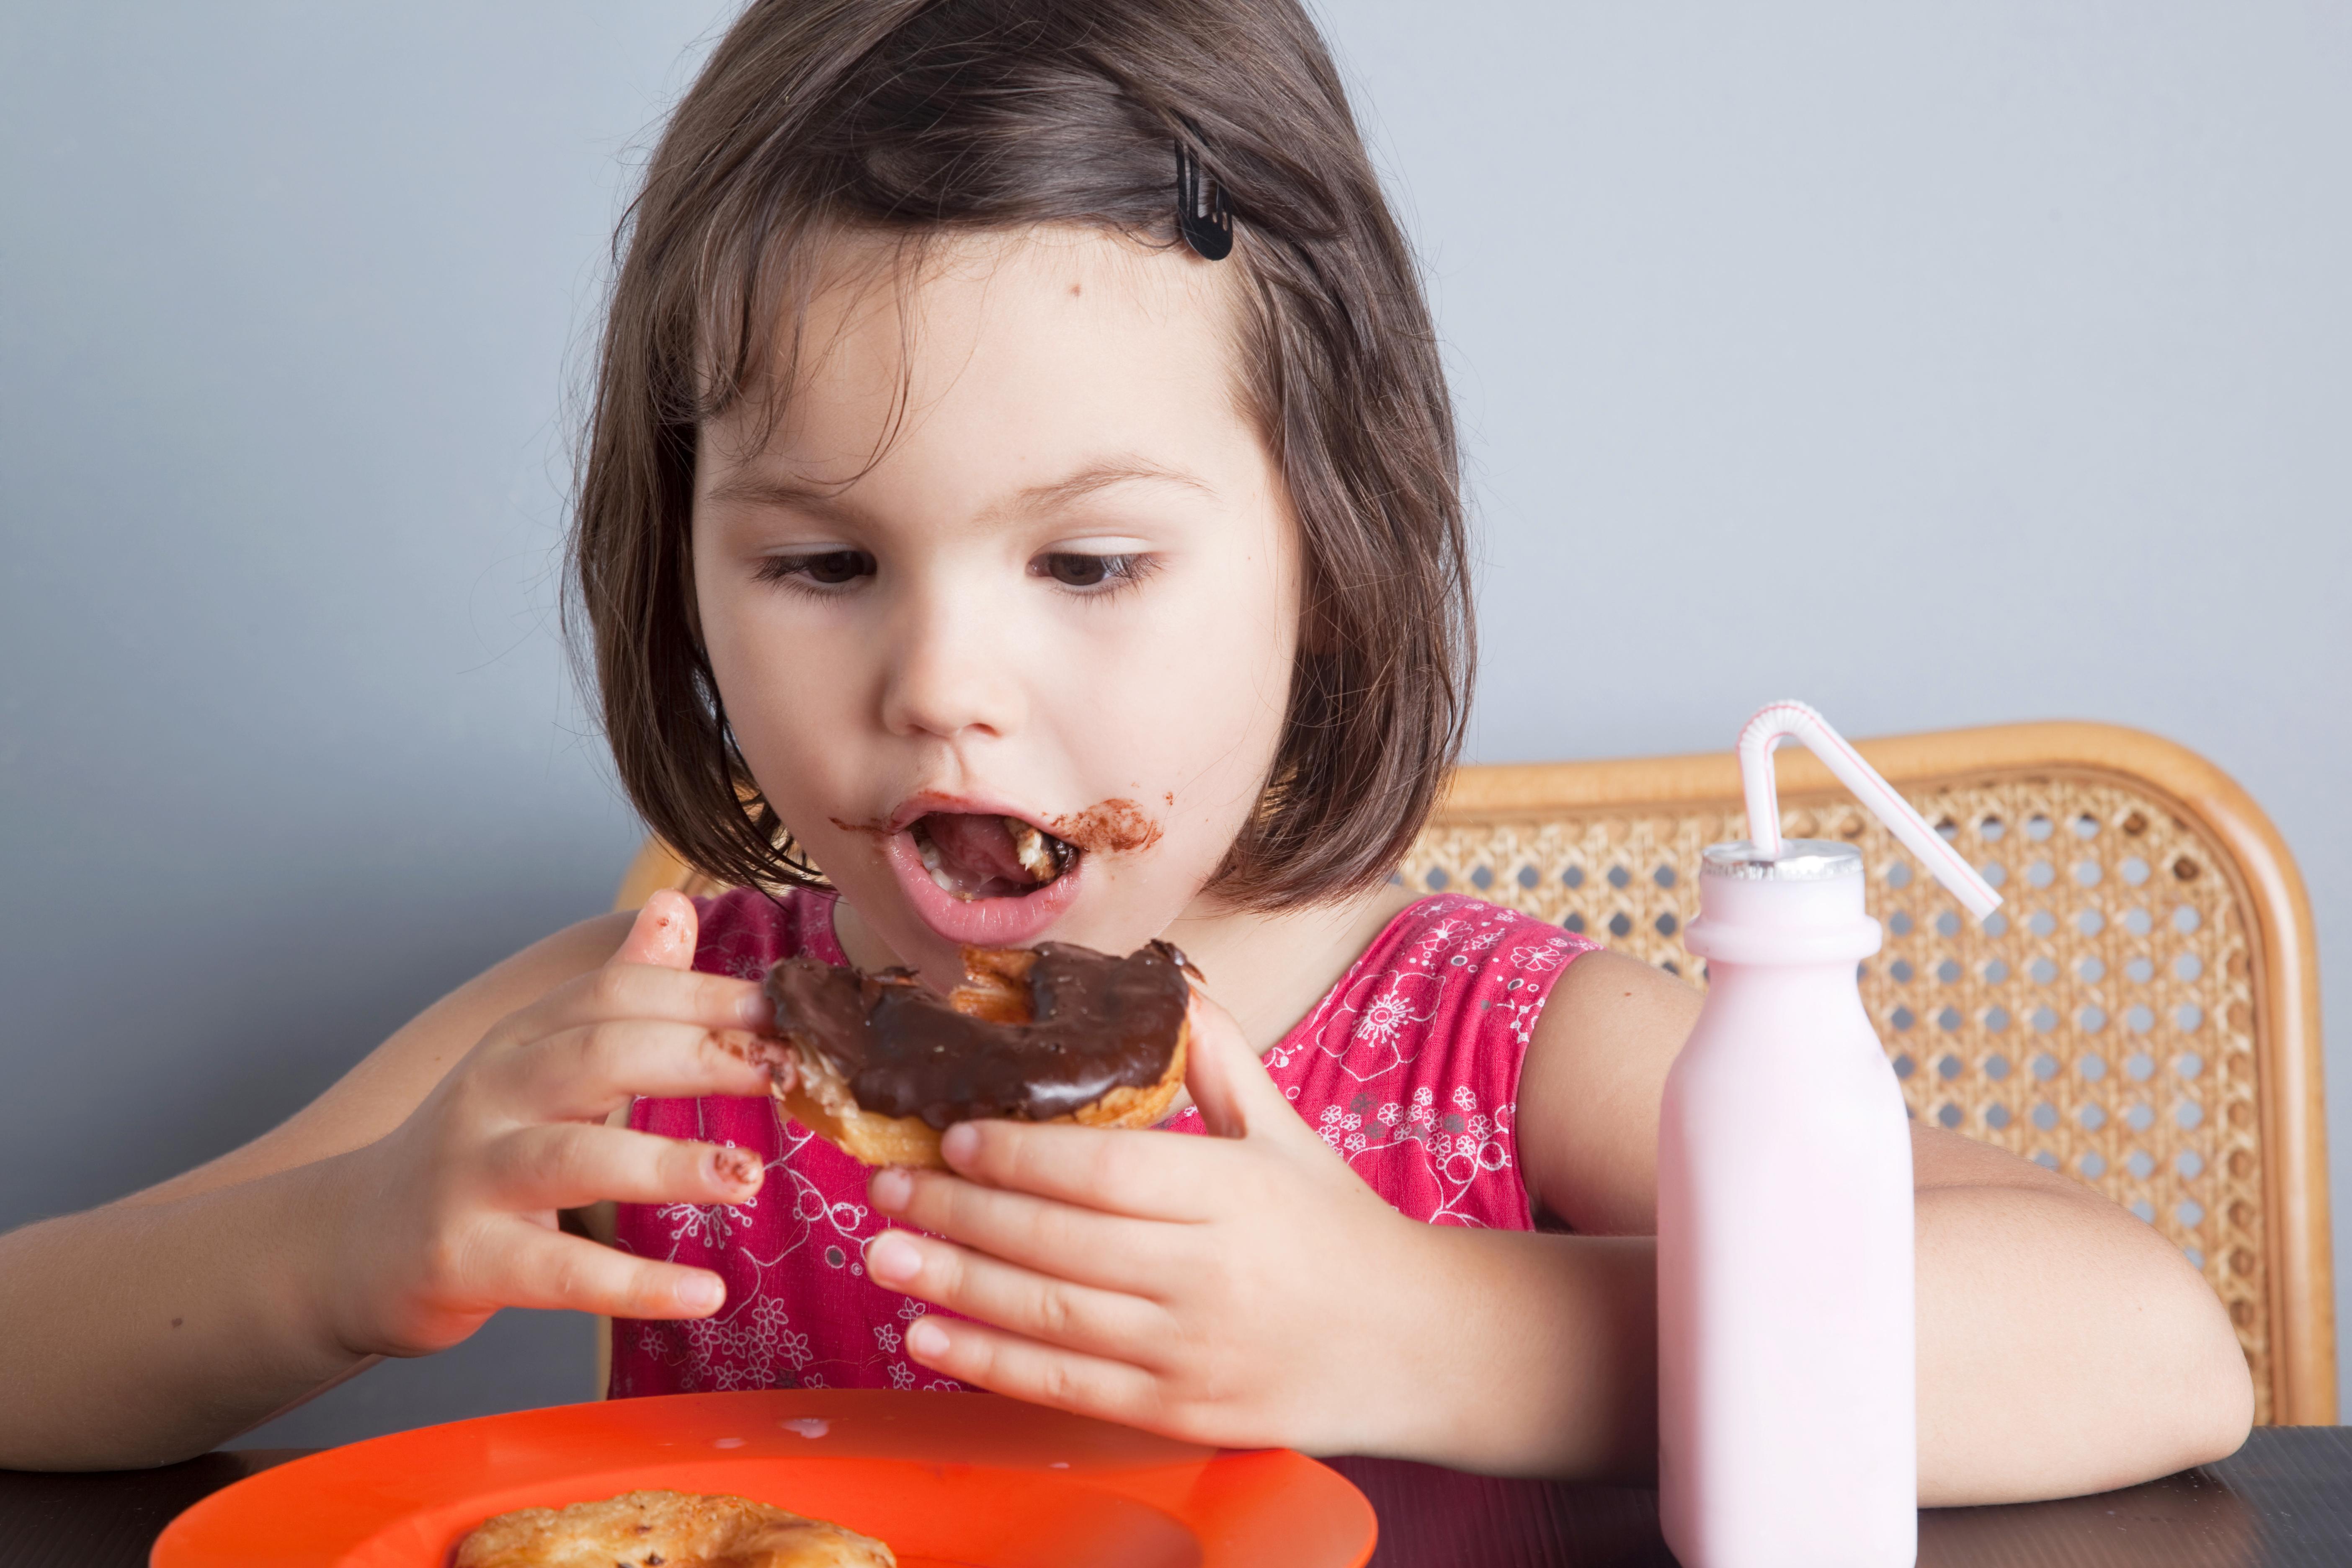 encuesta sobre el sobrepeso infantil